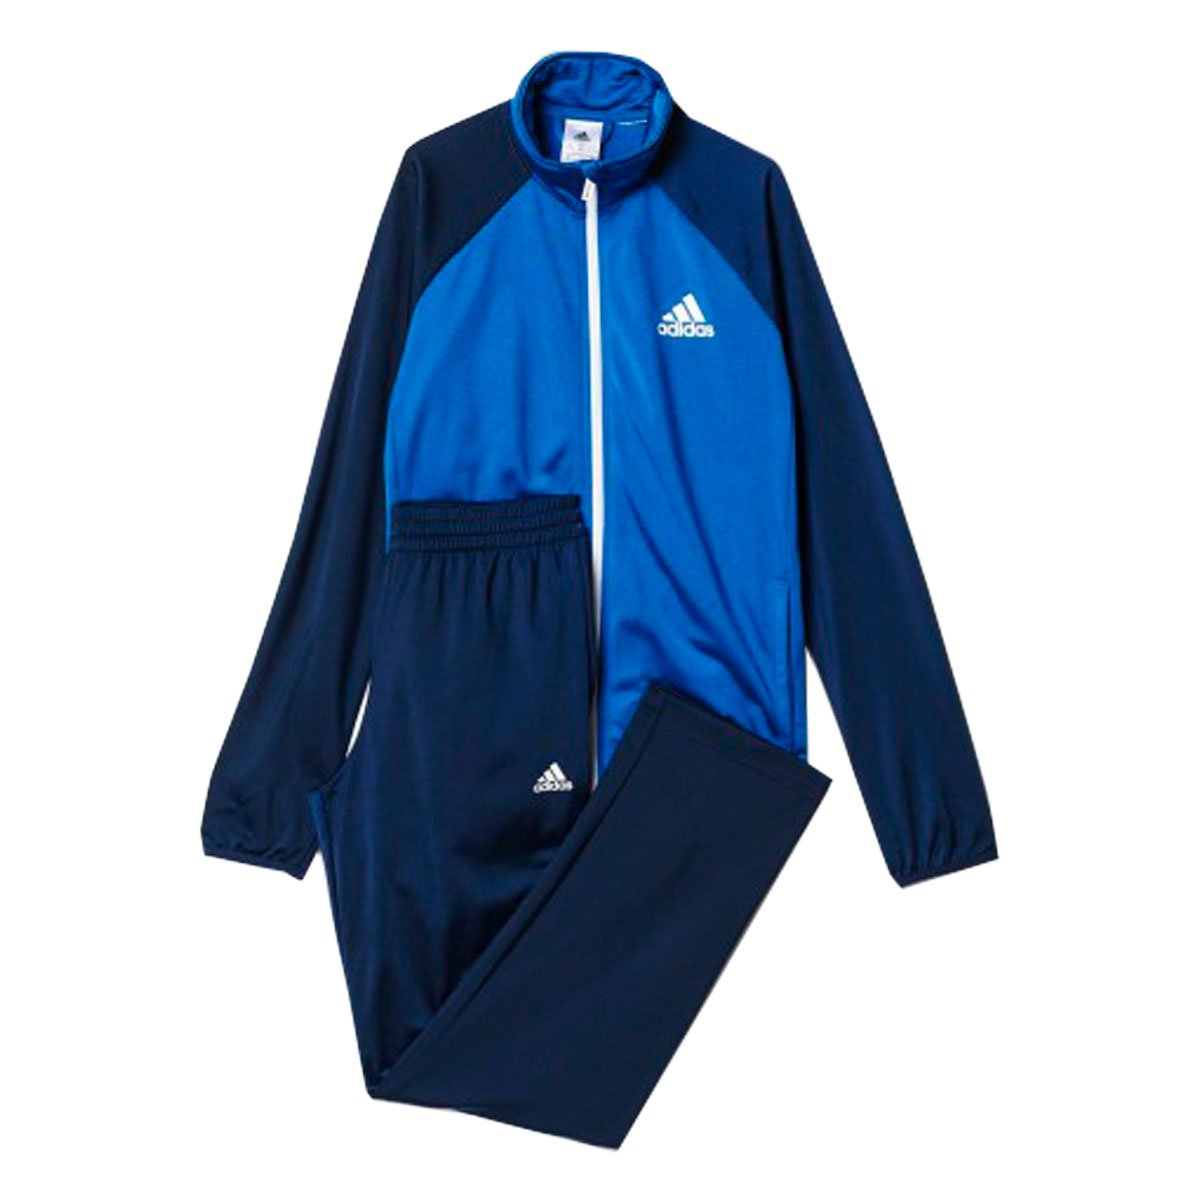 08deb2217a3 Bizz Store - Agasalho Infantil Juvenil Adidas YB TS Entry Oh